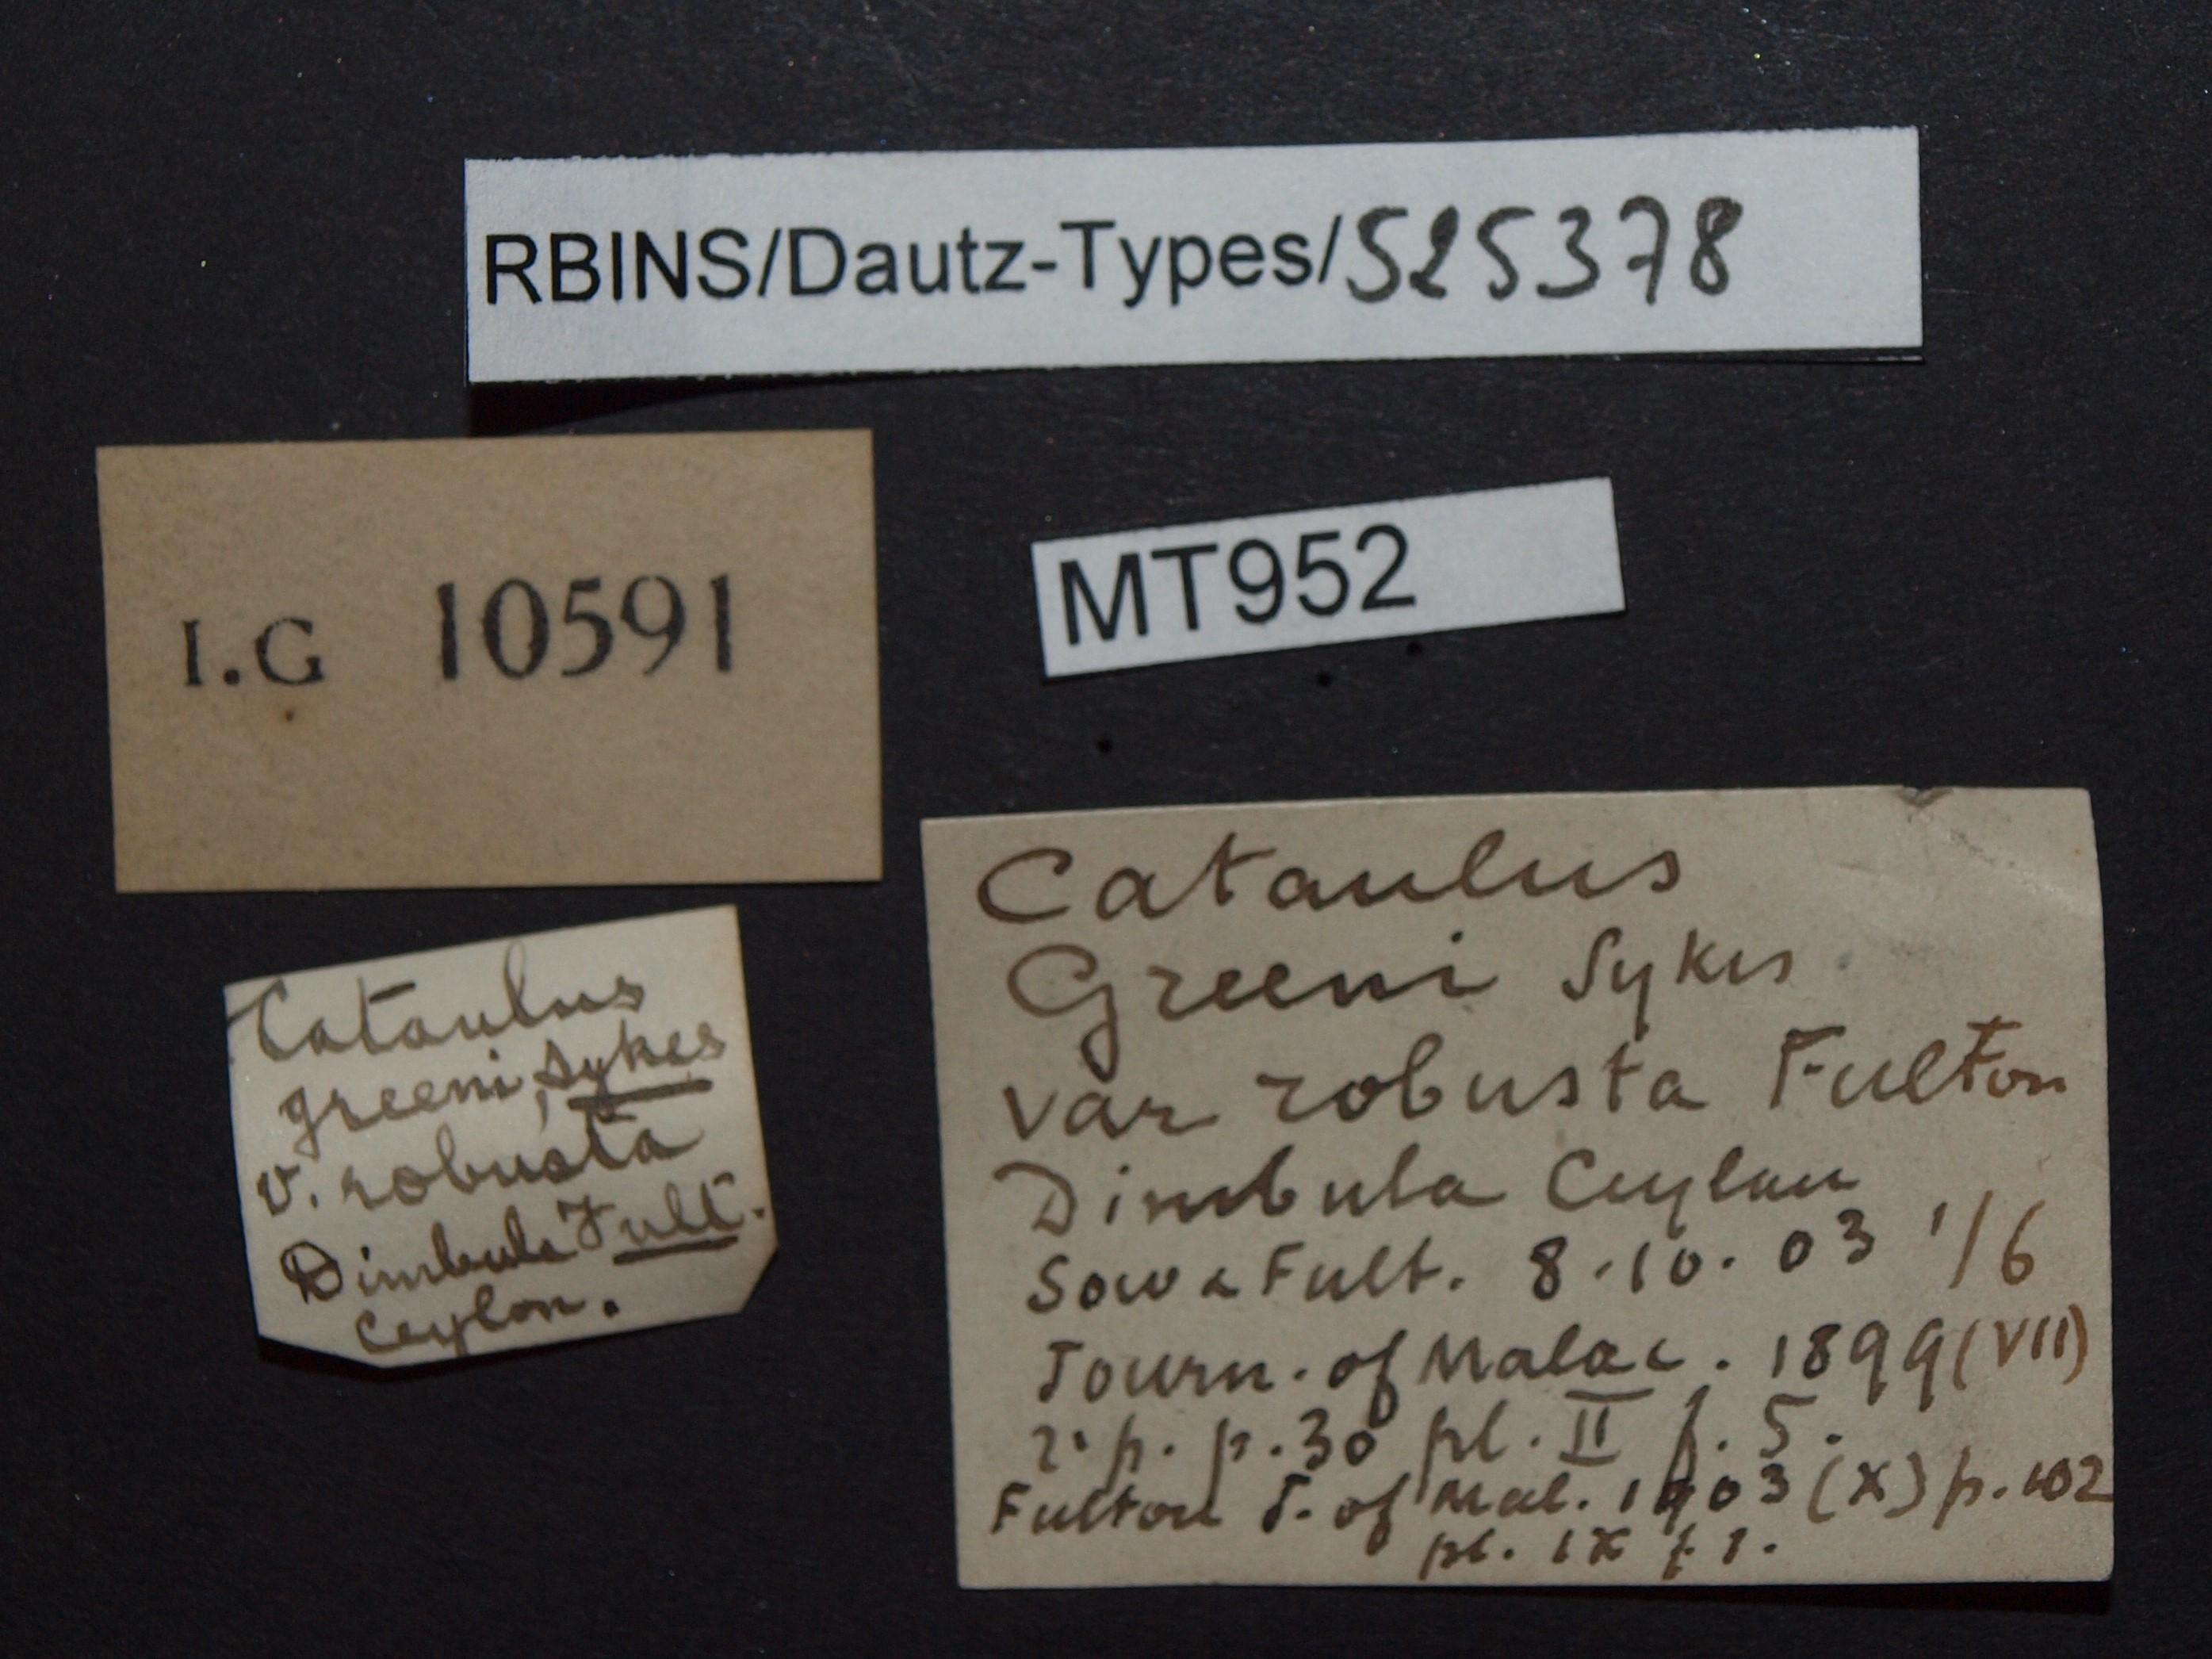 BE-RBINS-INV MT 952 Cataulus greeni var. robusta pt Lb.JPG